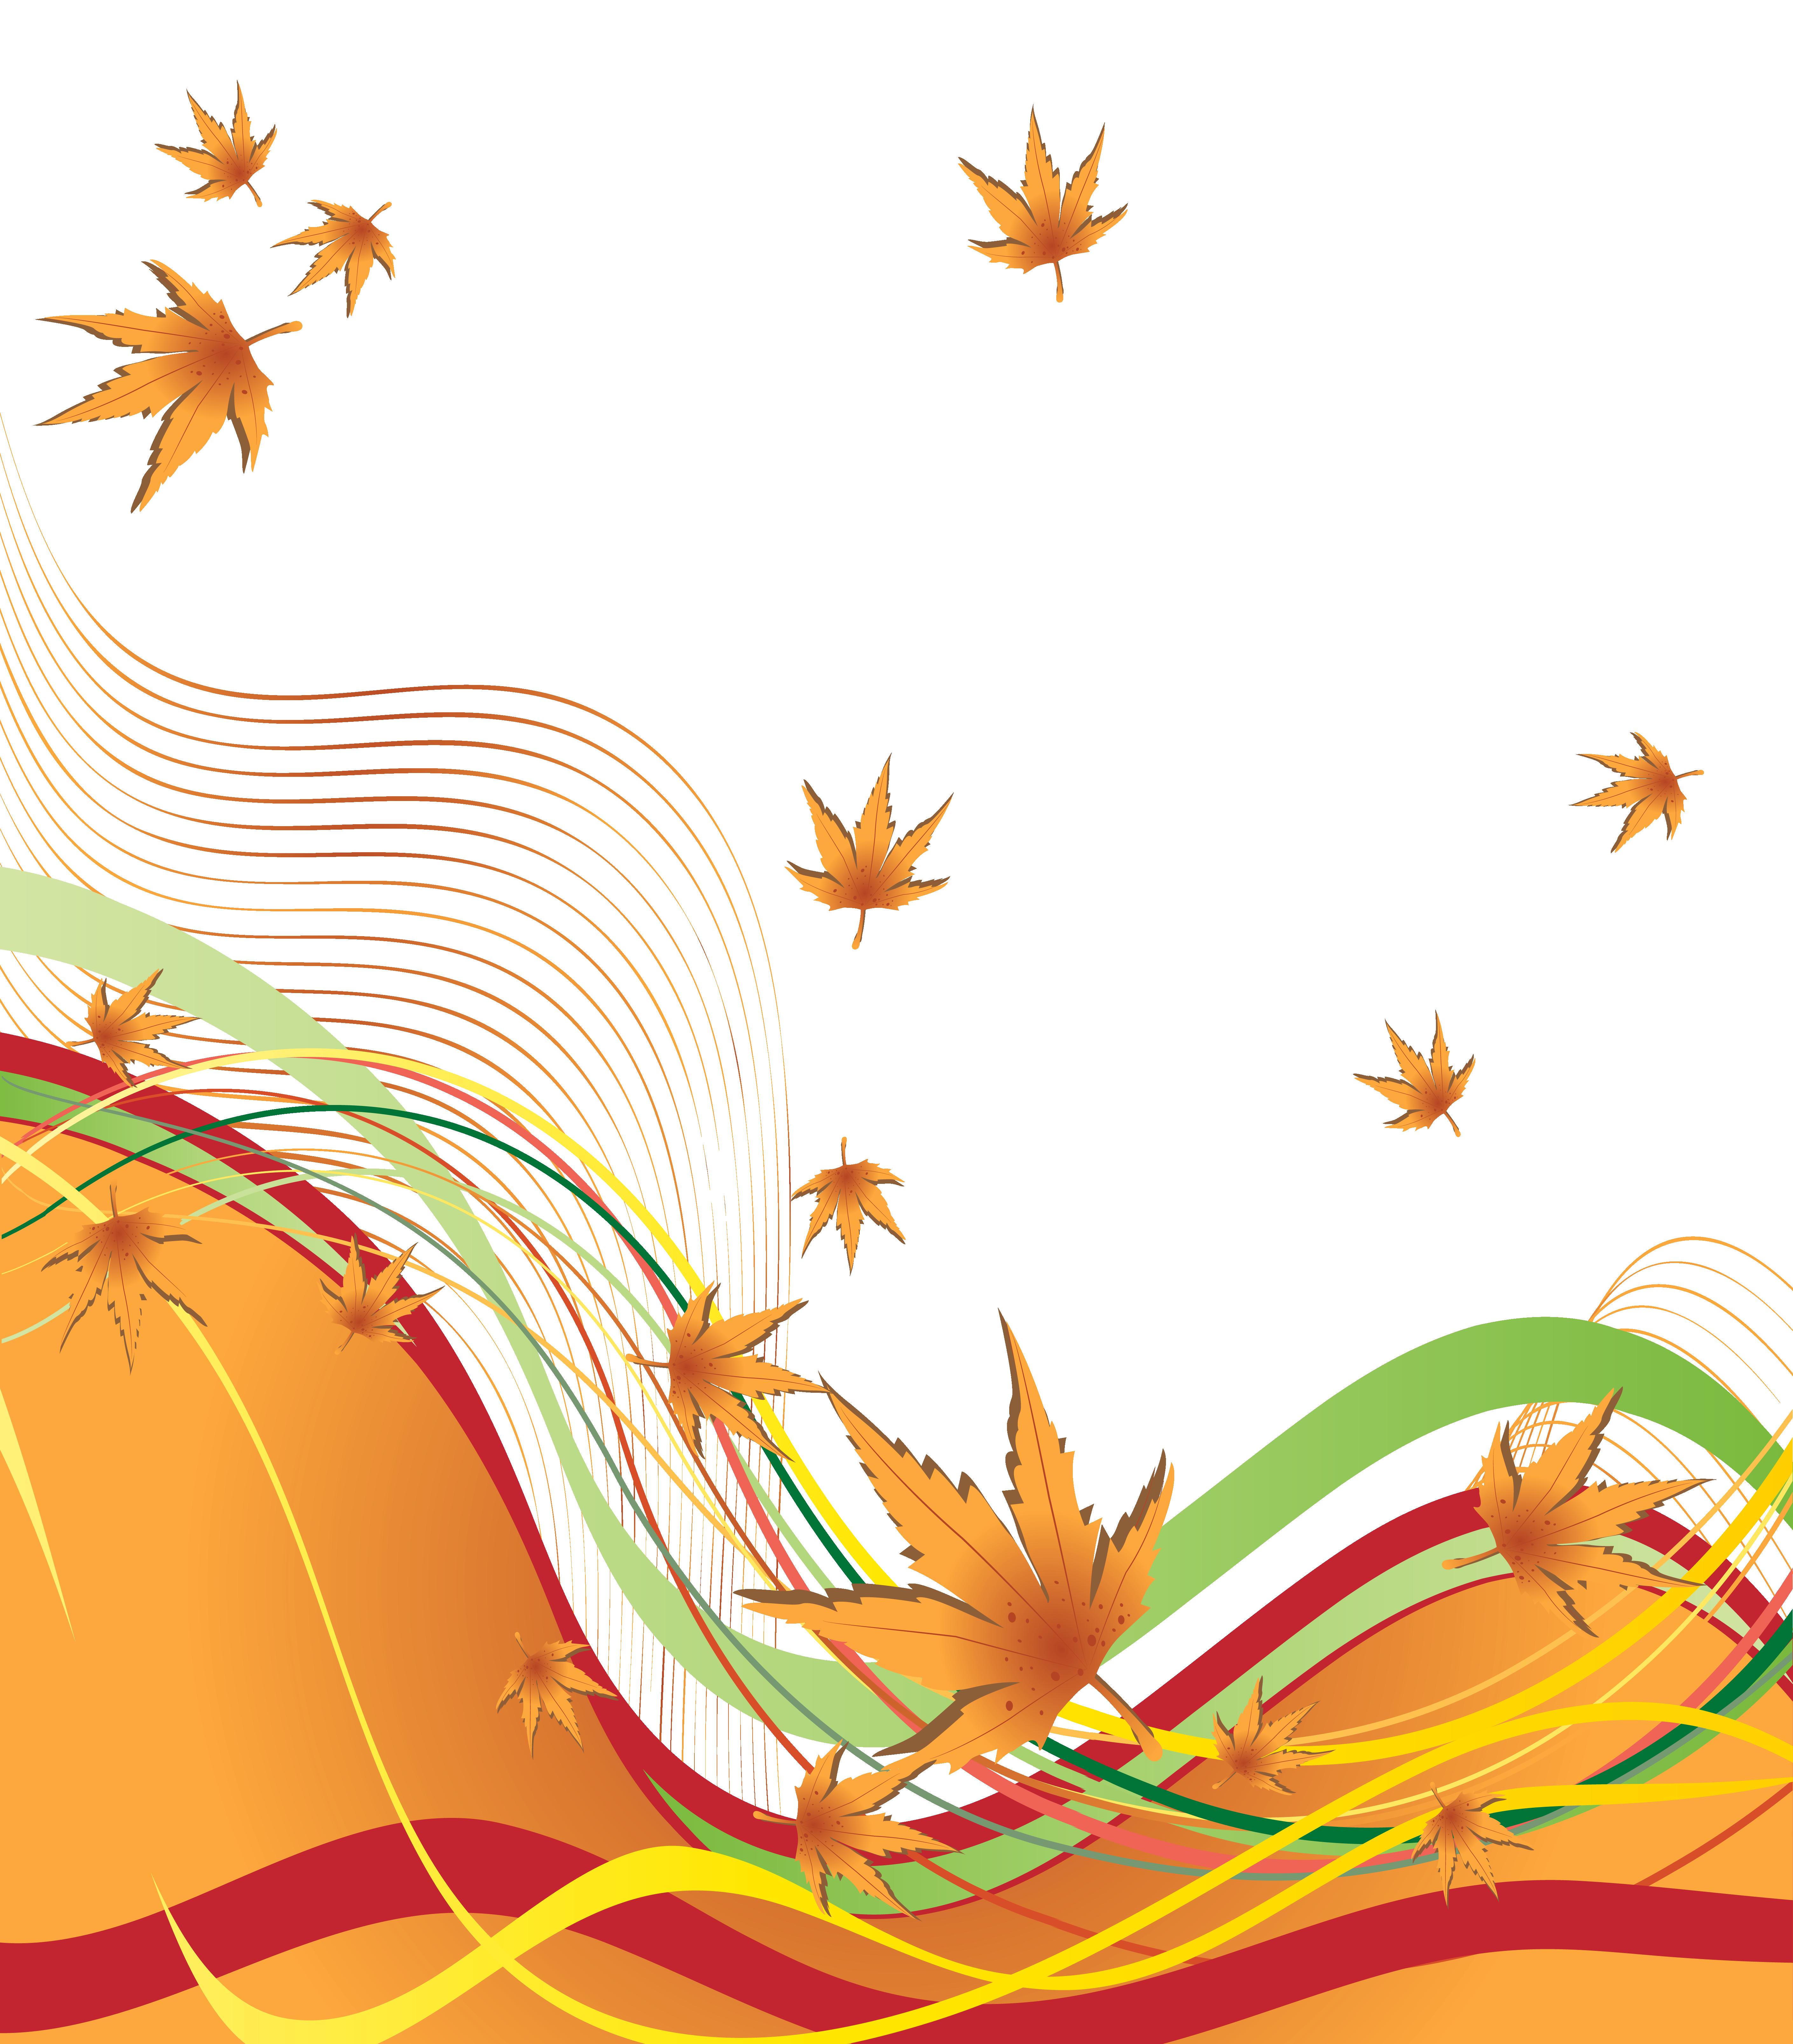 5639x6428 Autumn Decorative Border Png Clipart Imageu200b Gallery Yopriceville